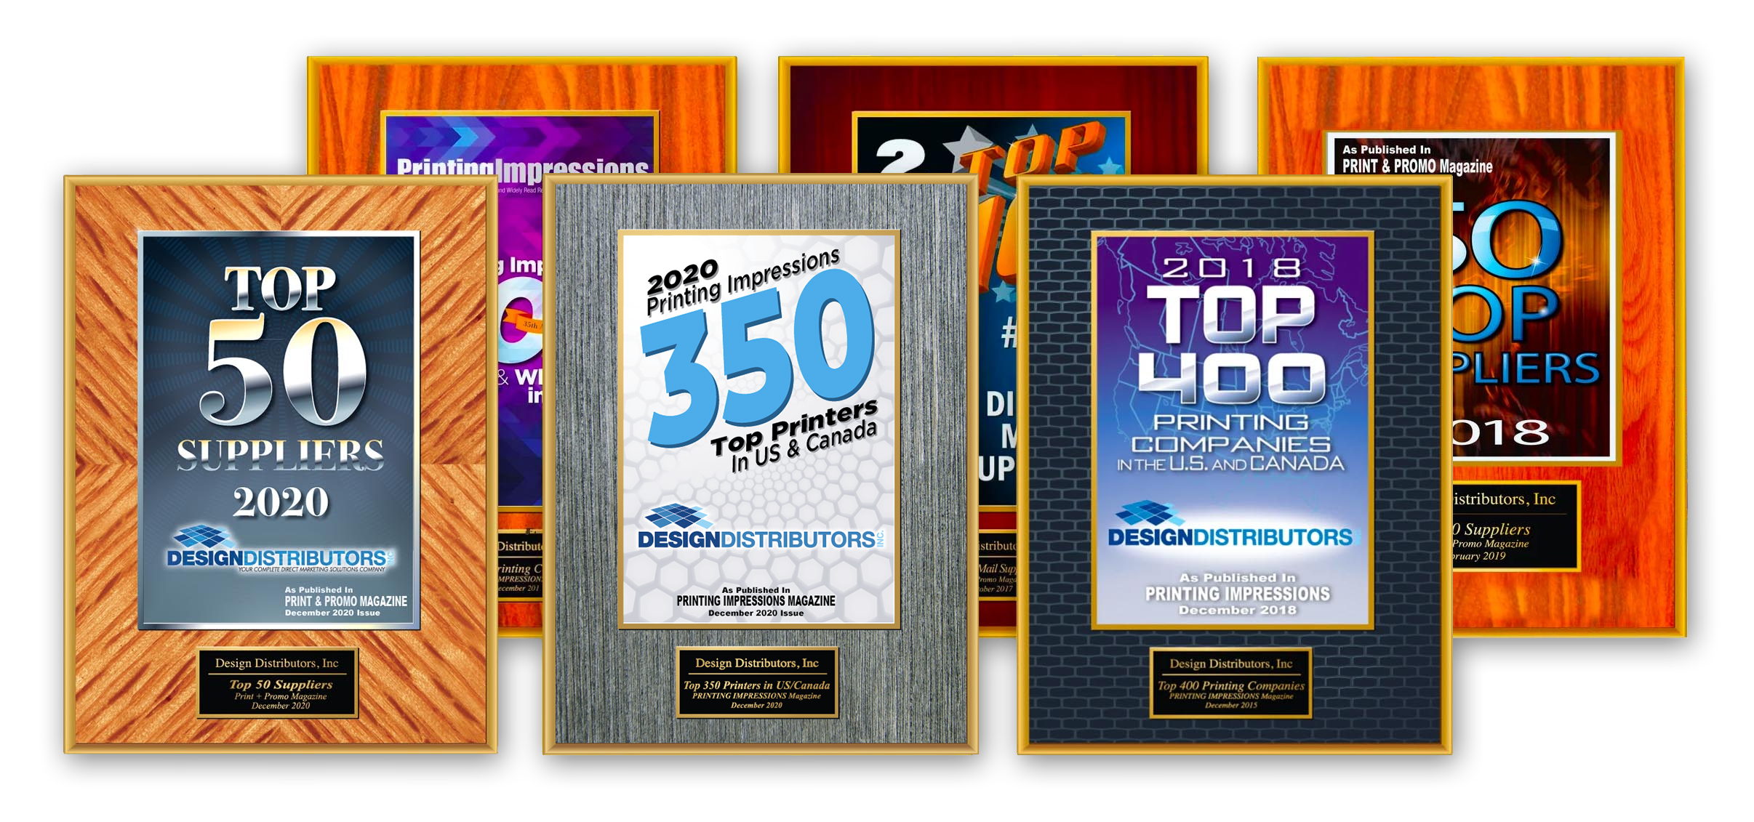 Awards Design Distributors Has Won